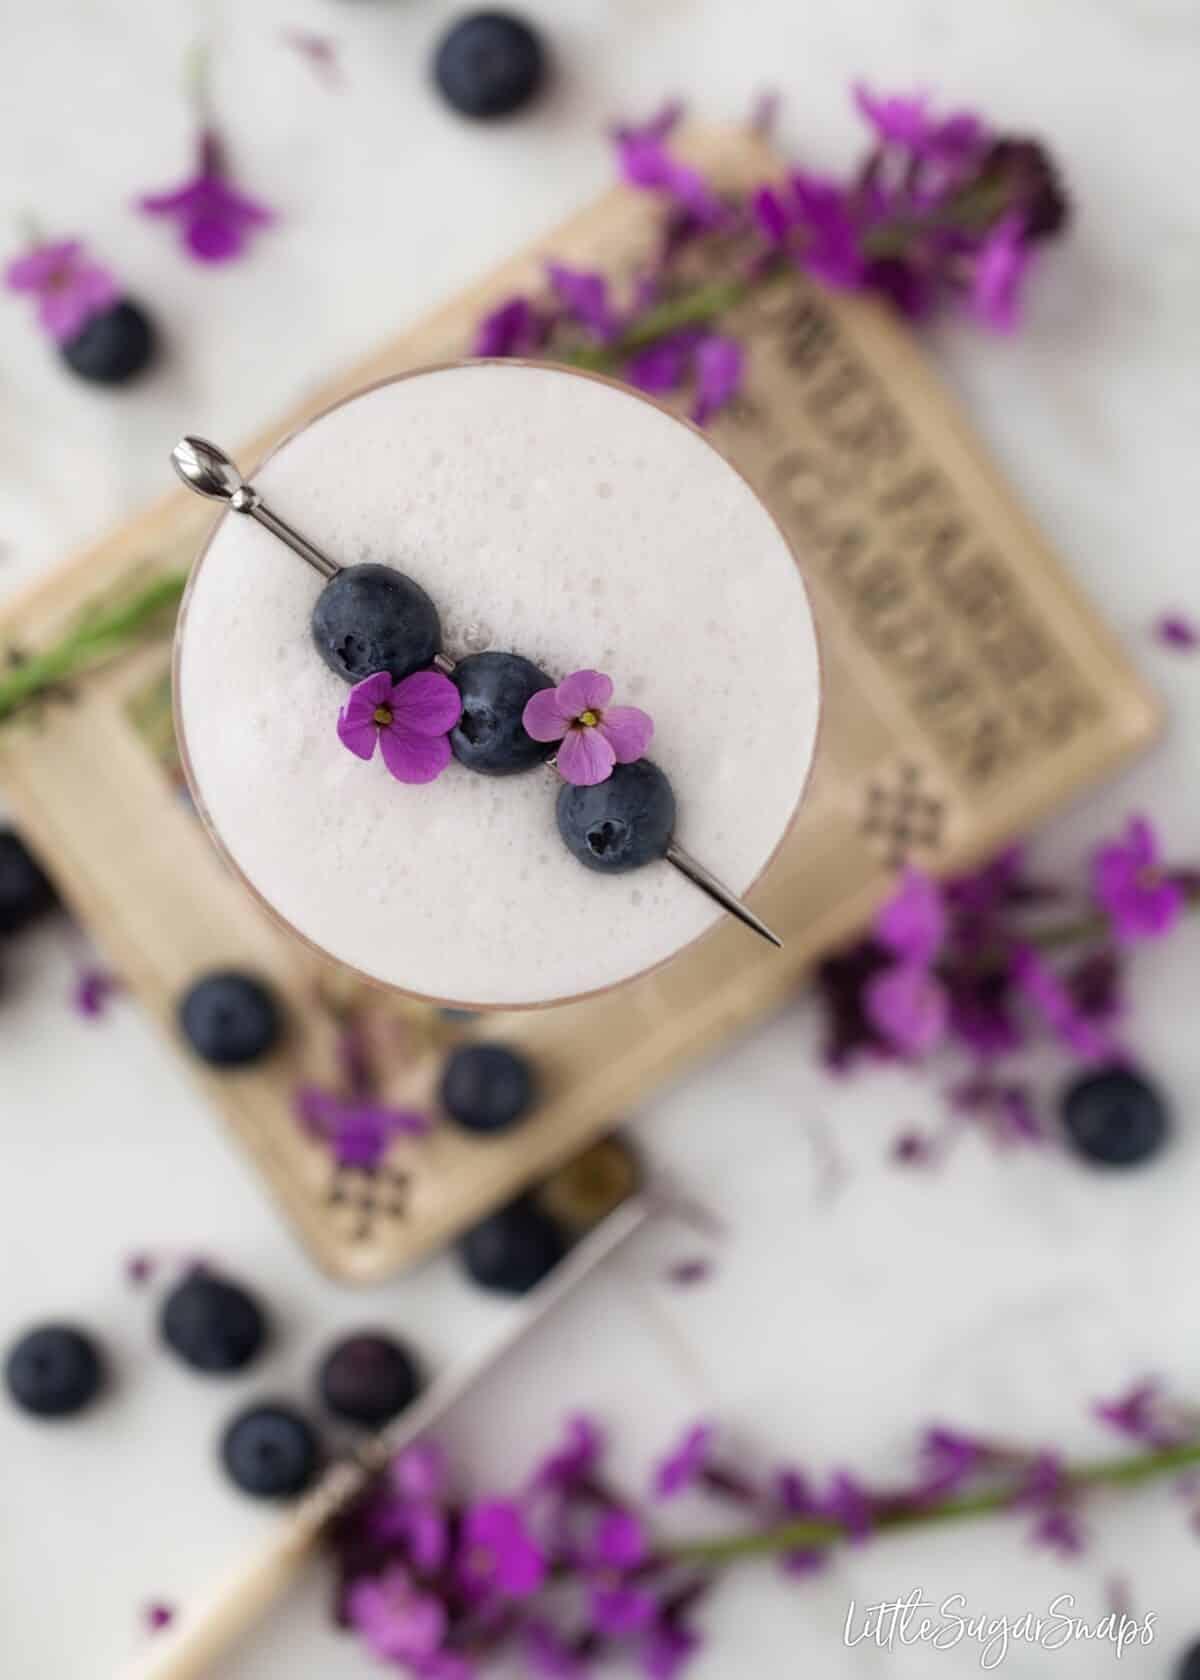 Violet Blueberry Gin Sou